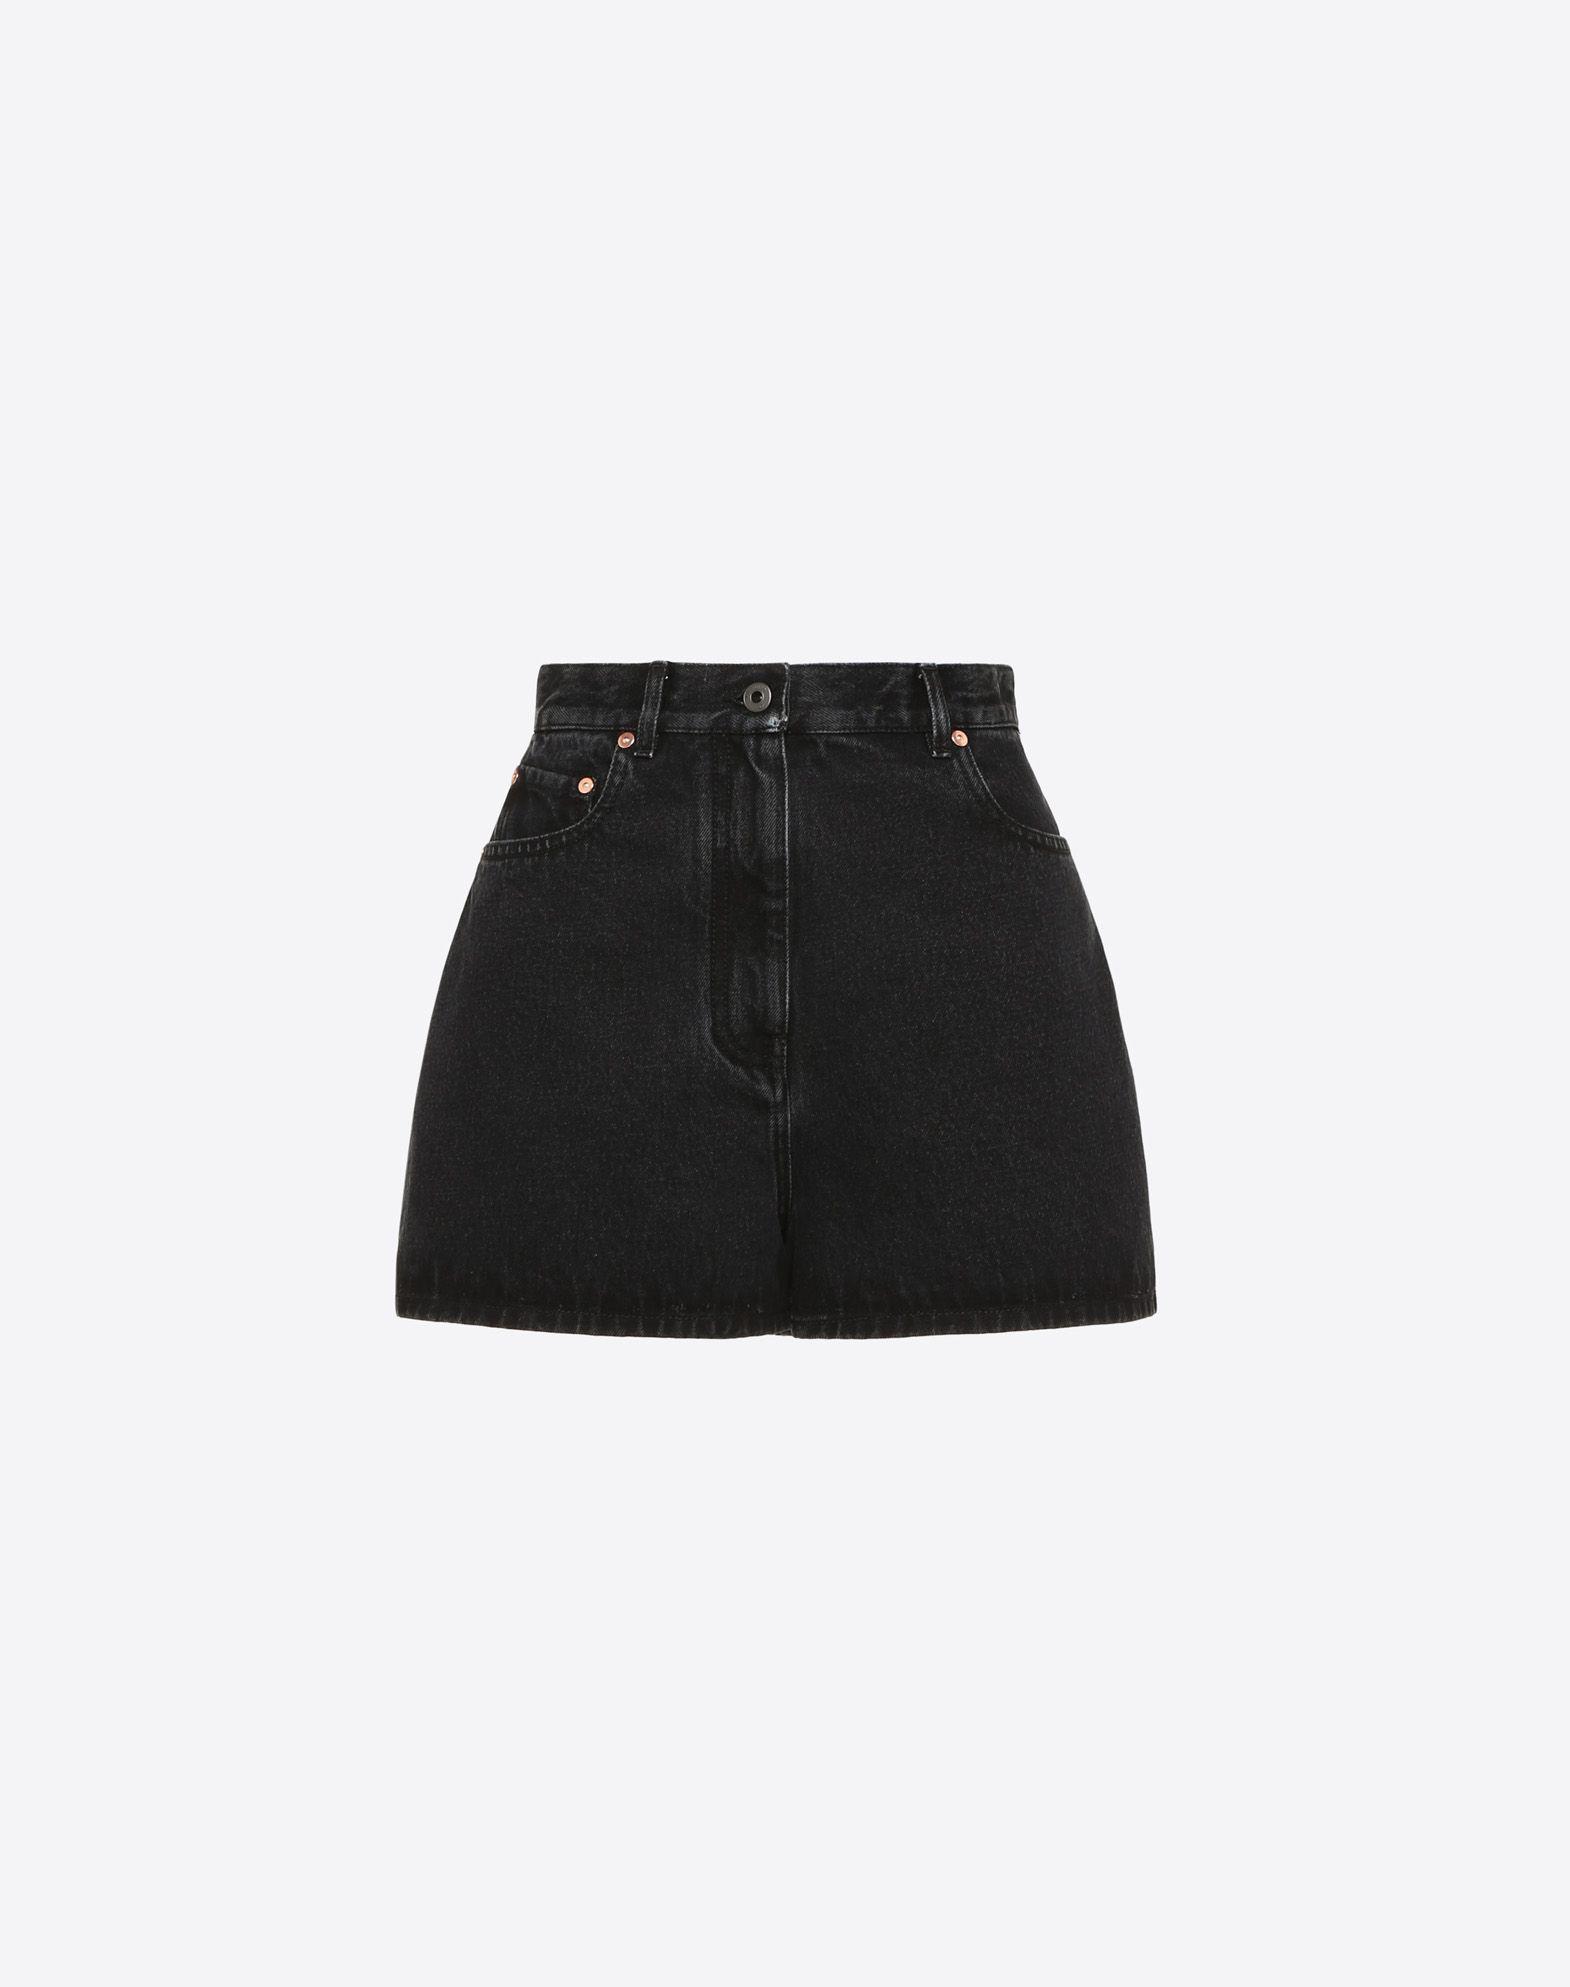 Deconstructed VLOGO Shorts